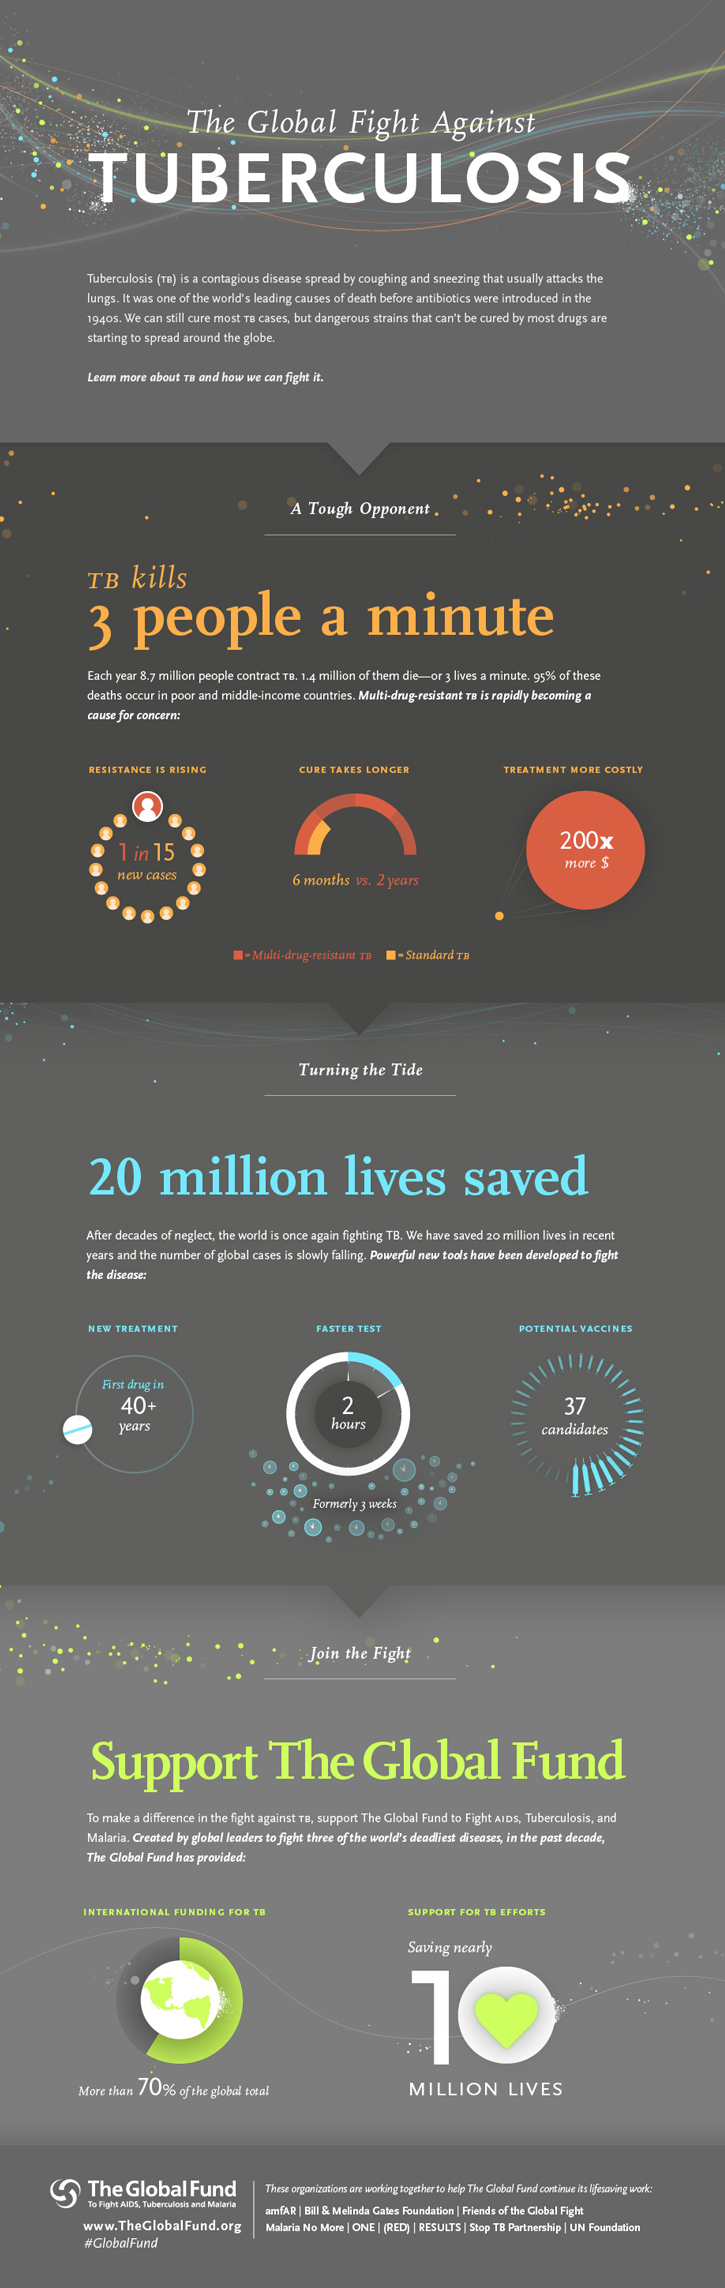 The Global Fight Against Tuberculosis Global fund, Nobel